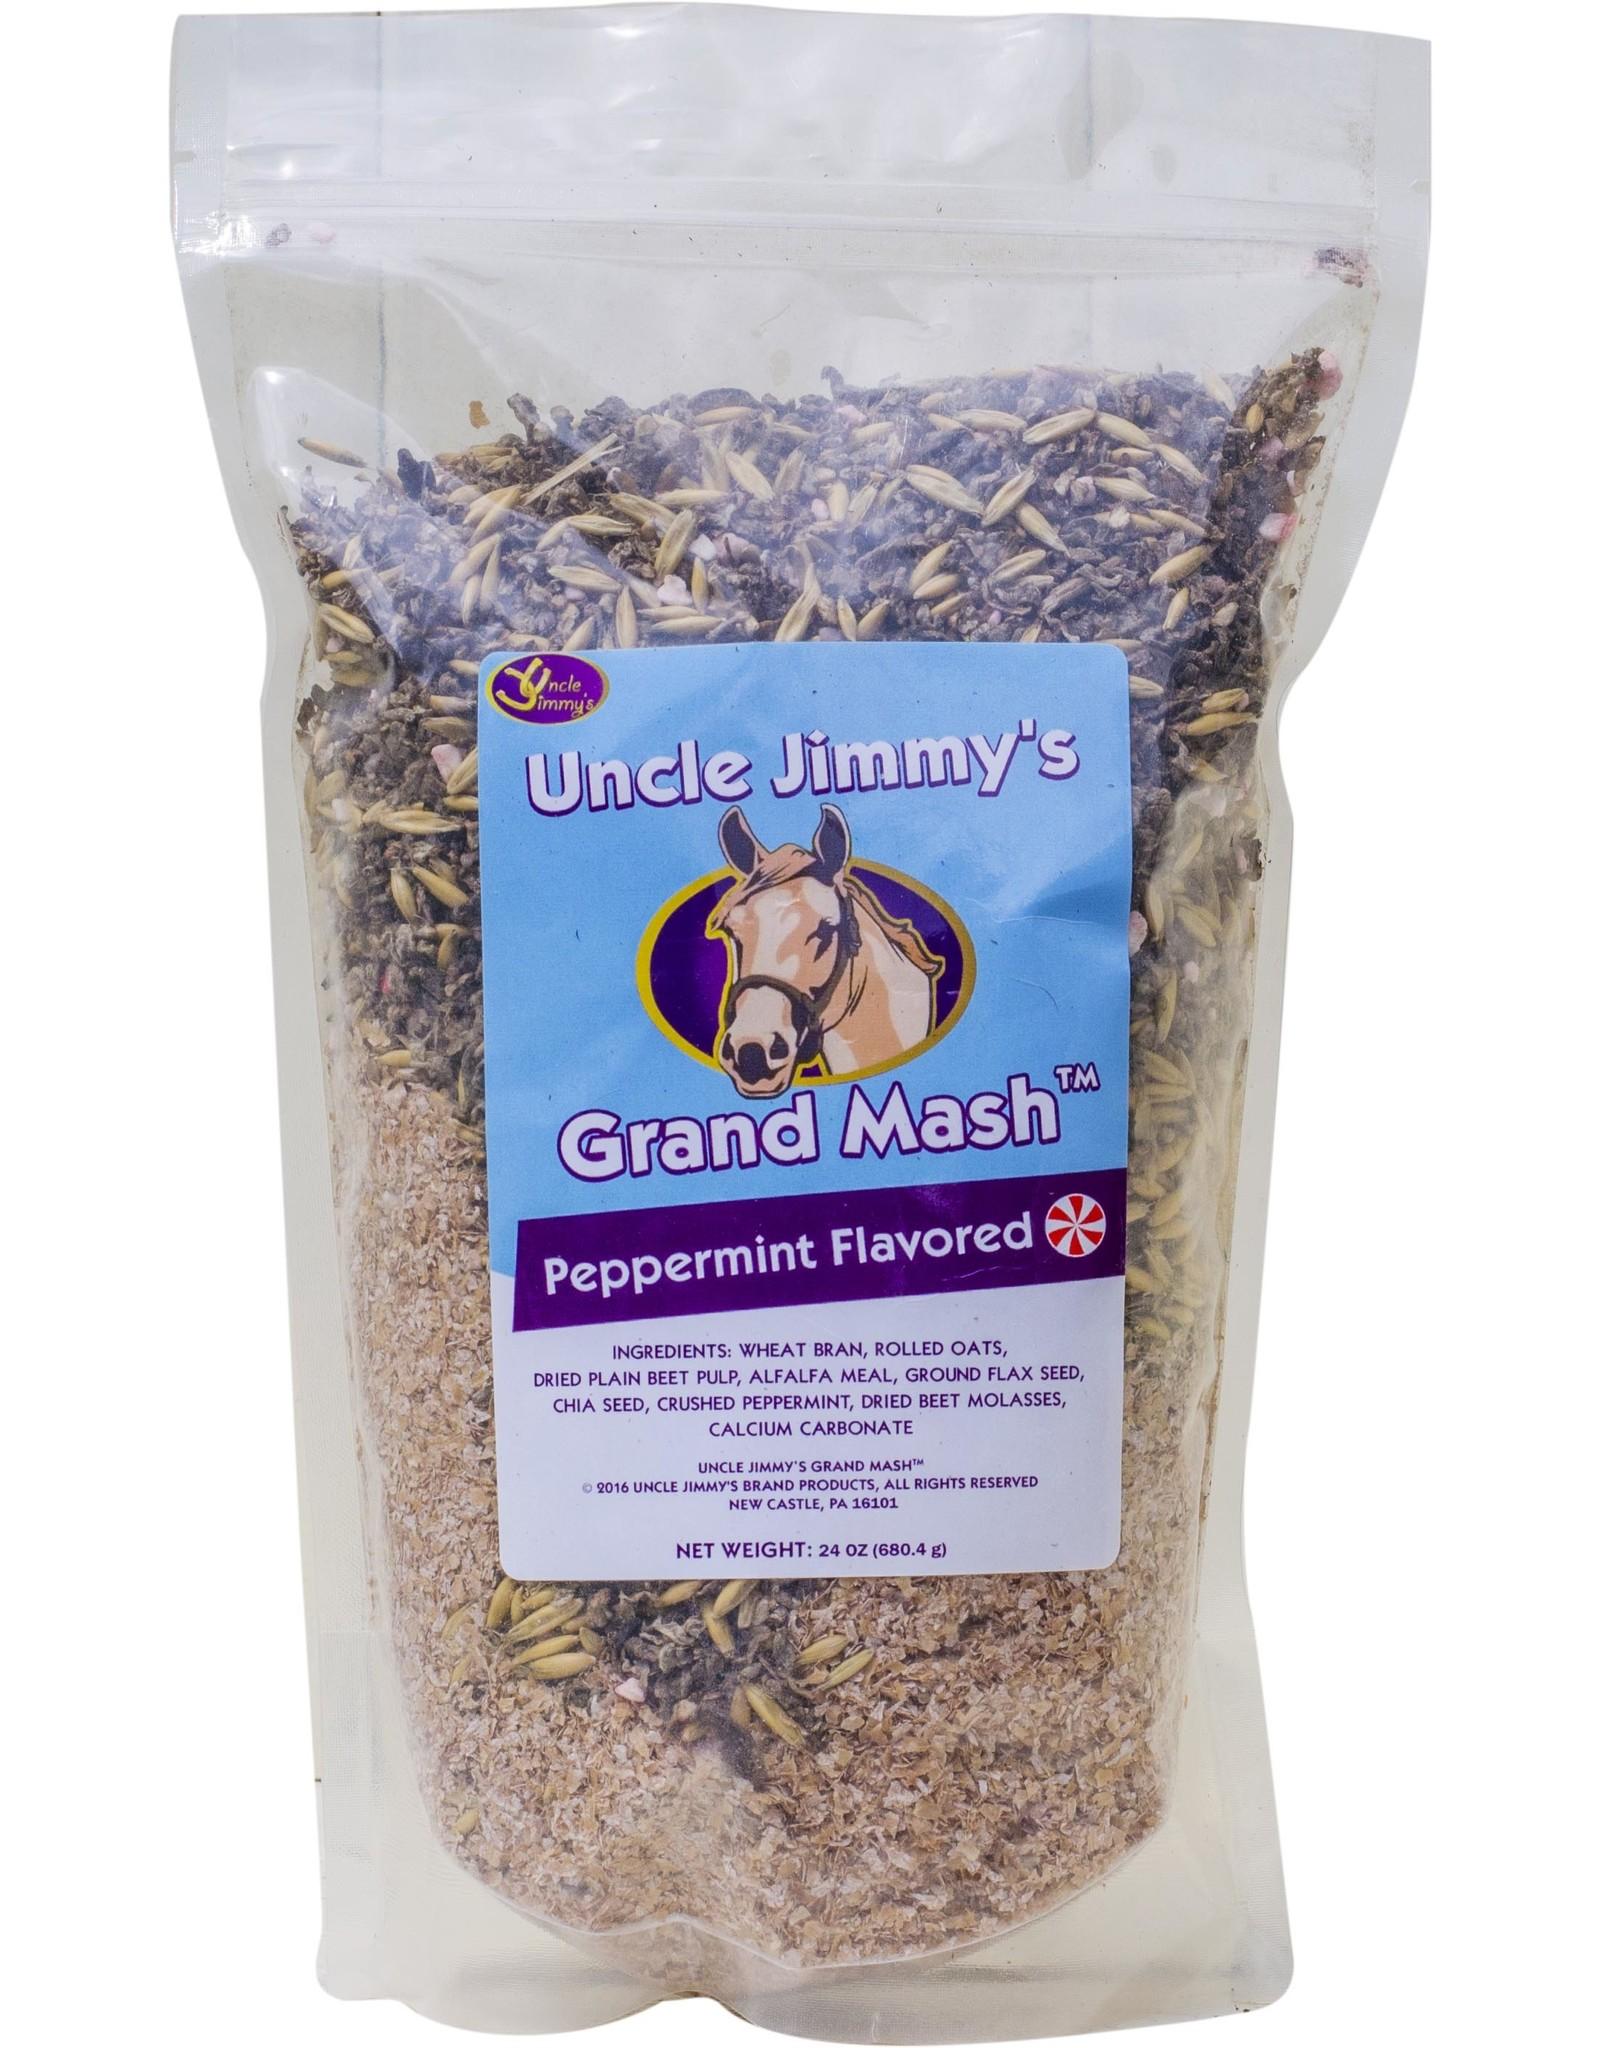 Uncle Jimmy's Grand Mash 24oz.